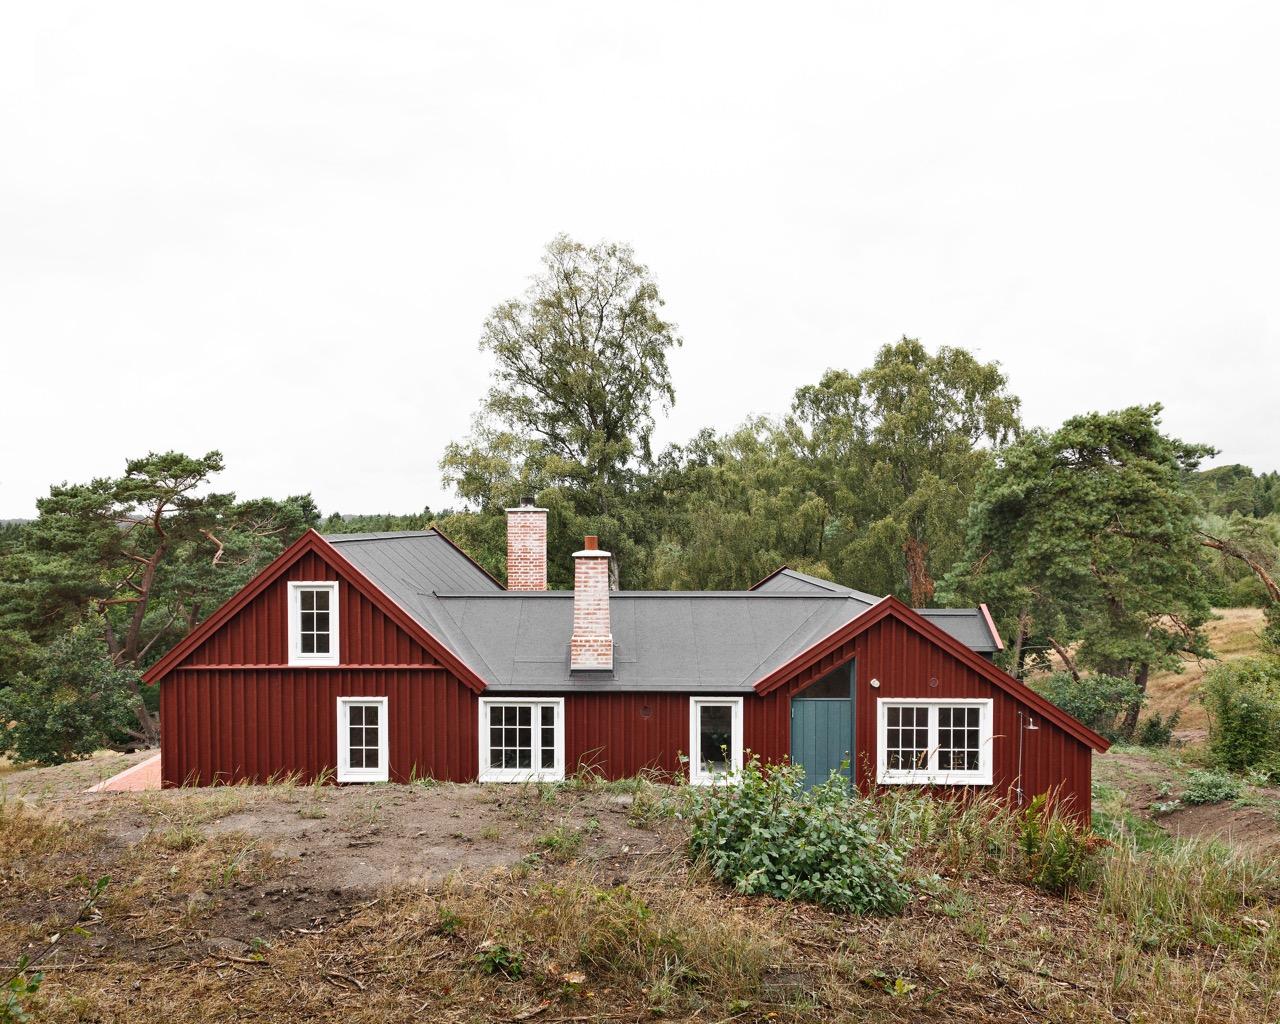 Cottage in landscape. Photo: Laura Stamer